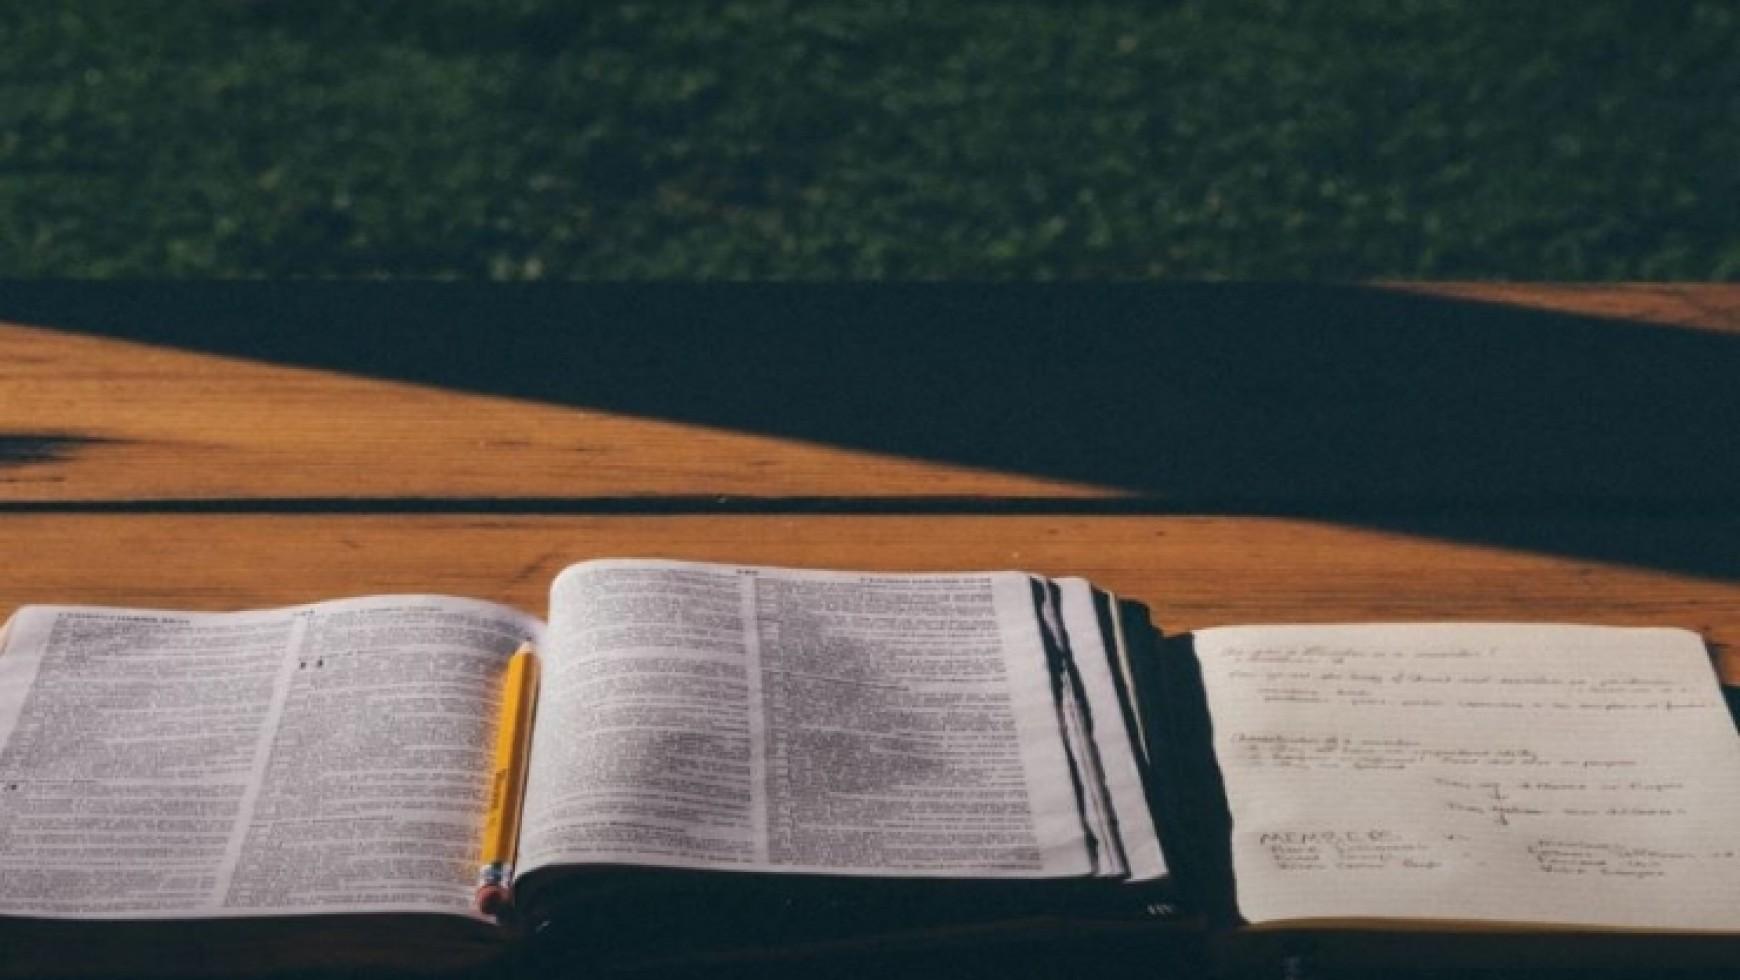 Know God – No Doubt